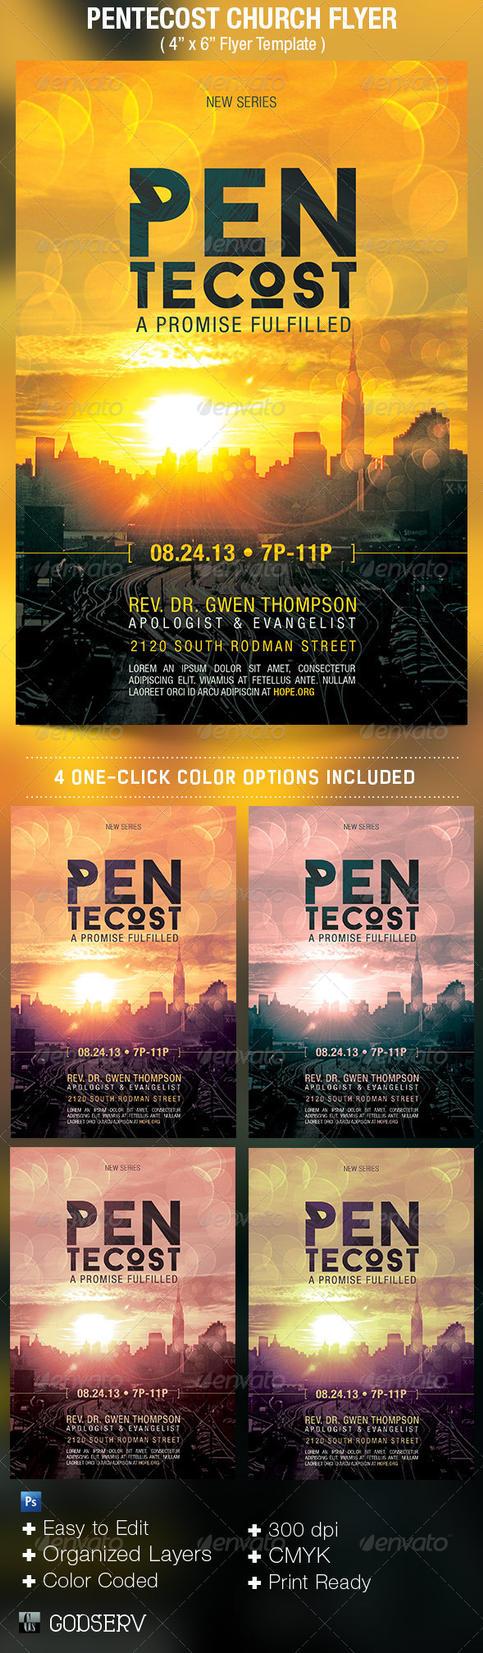 pentecost church flyer template by godserv on deviantart. Black Bedroom Furniture Sets. Home Design Ideas